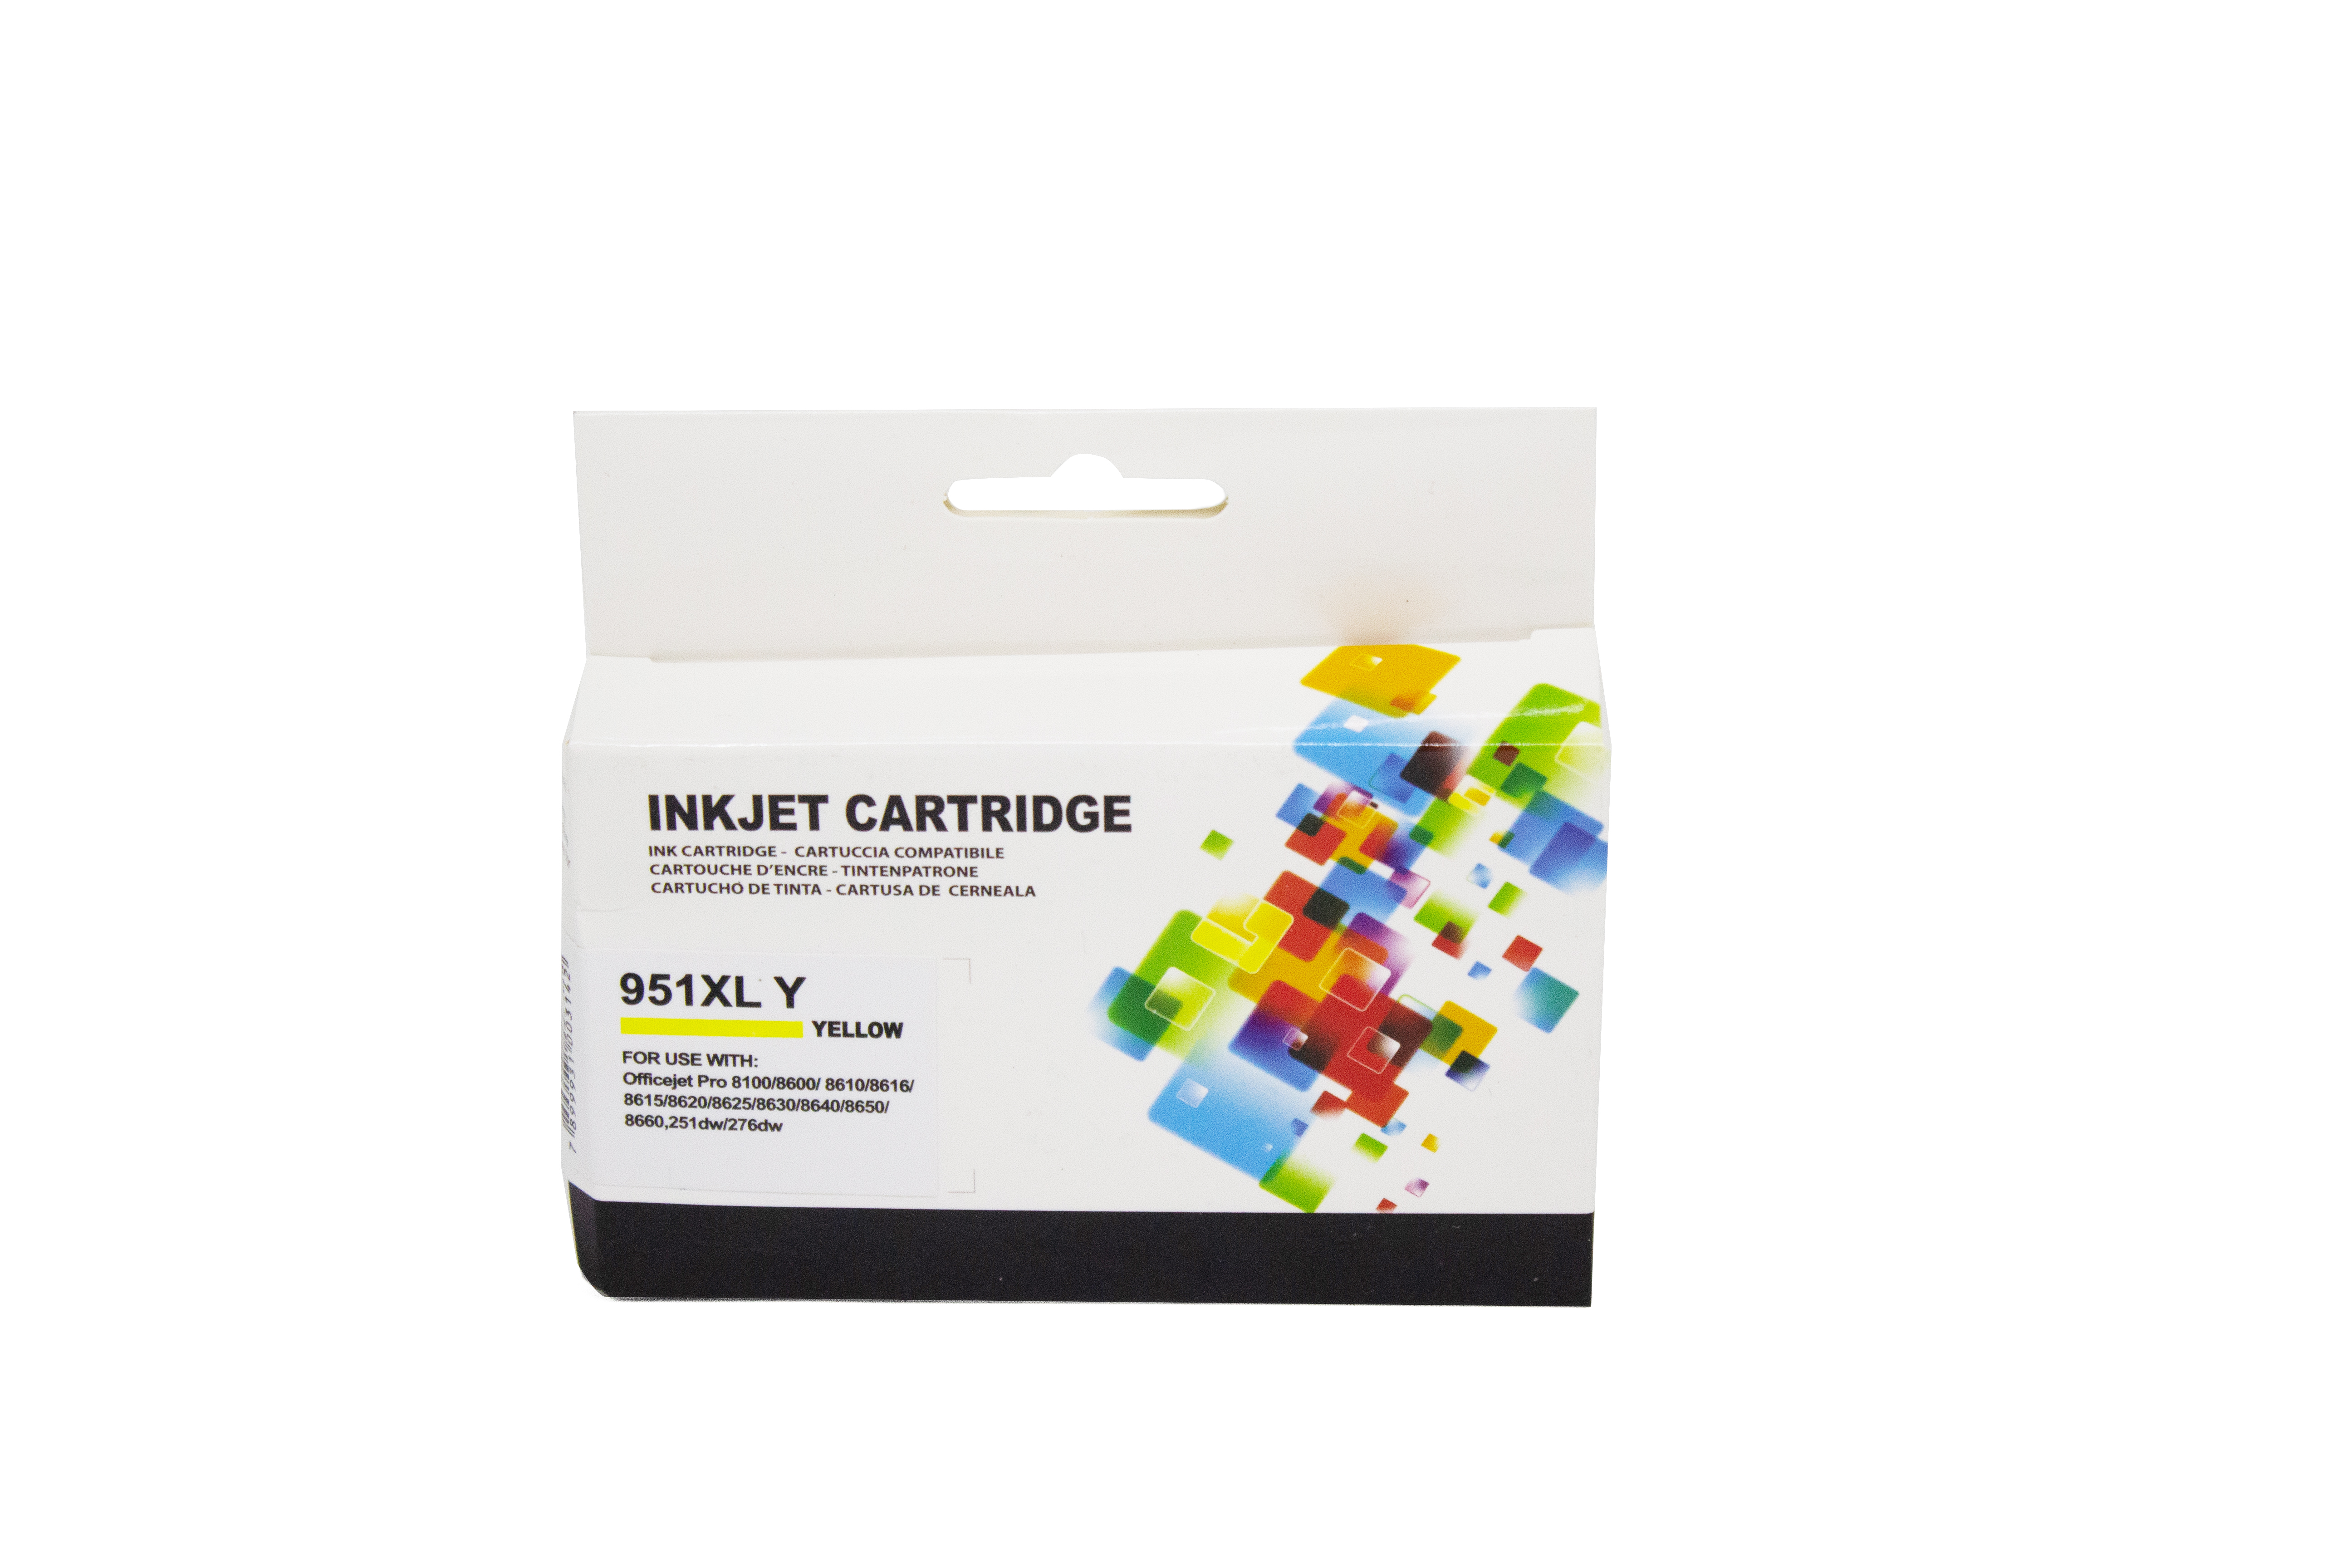 CARTUCHO TINTA HP 950 XL | PRO 8100 | 8600 | N911 | CN 048AN  YELLOW COMPATÍVEL PROFIT